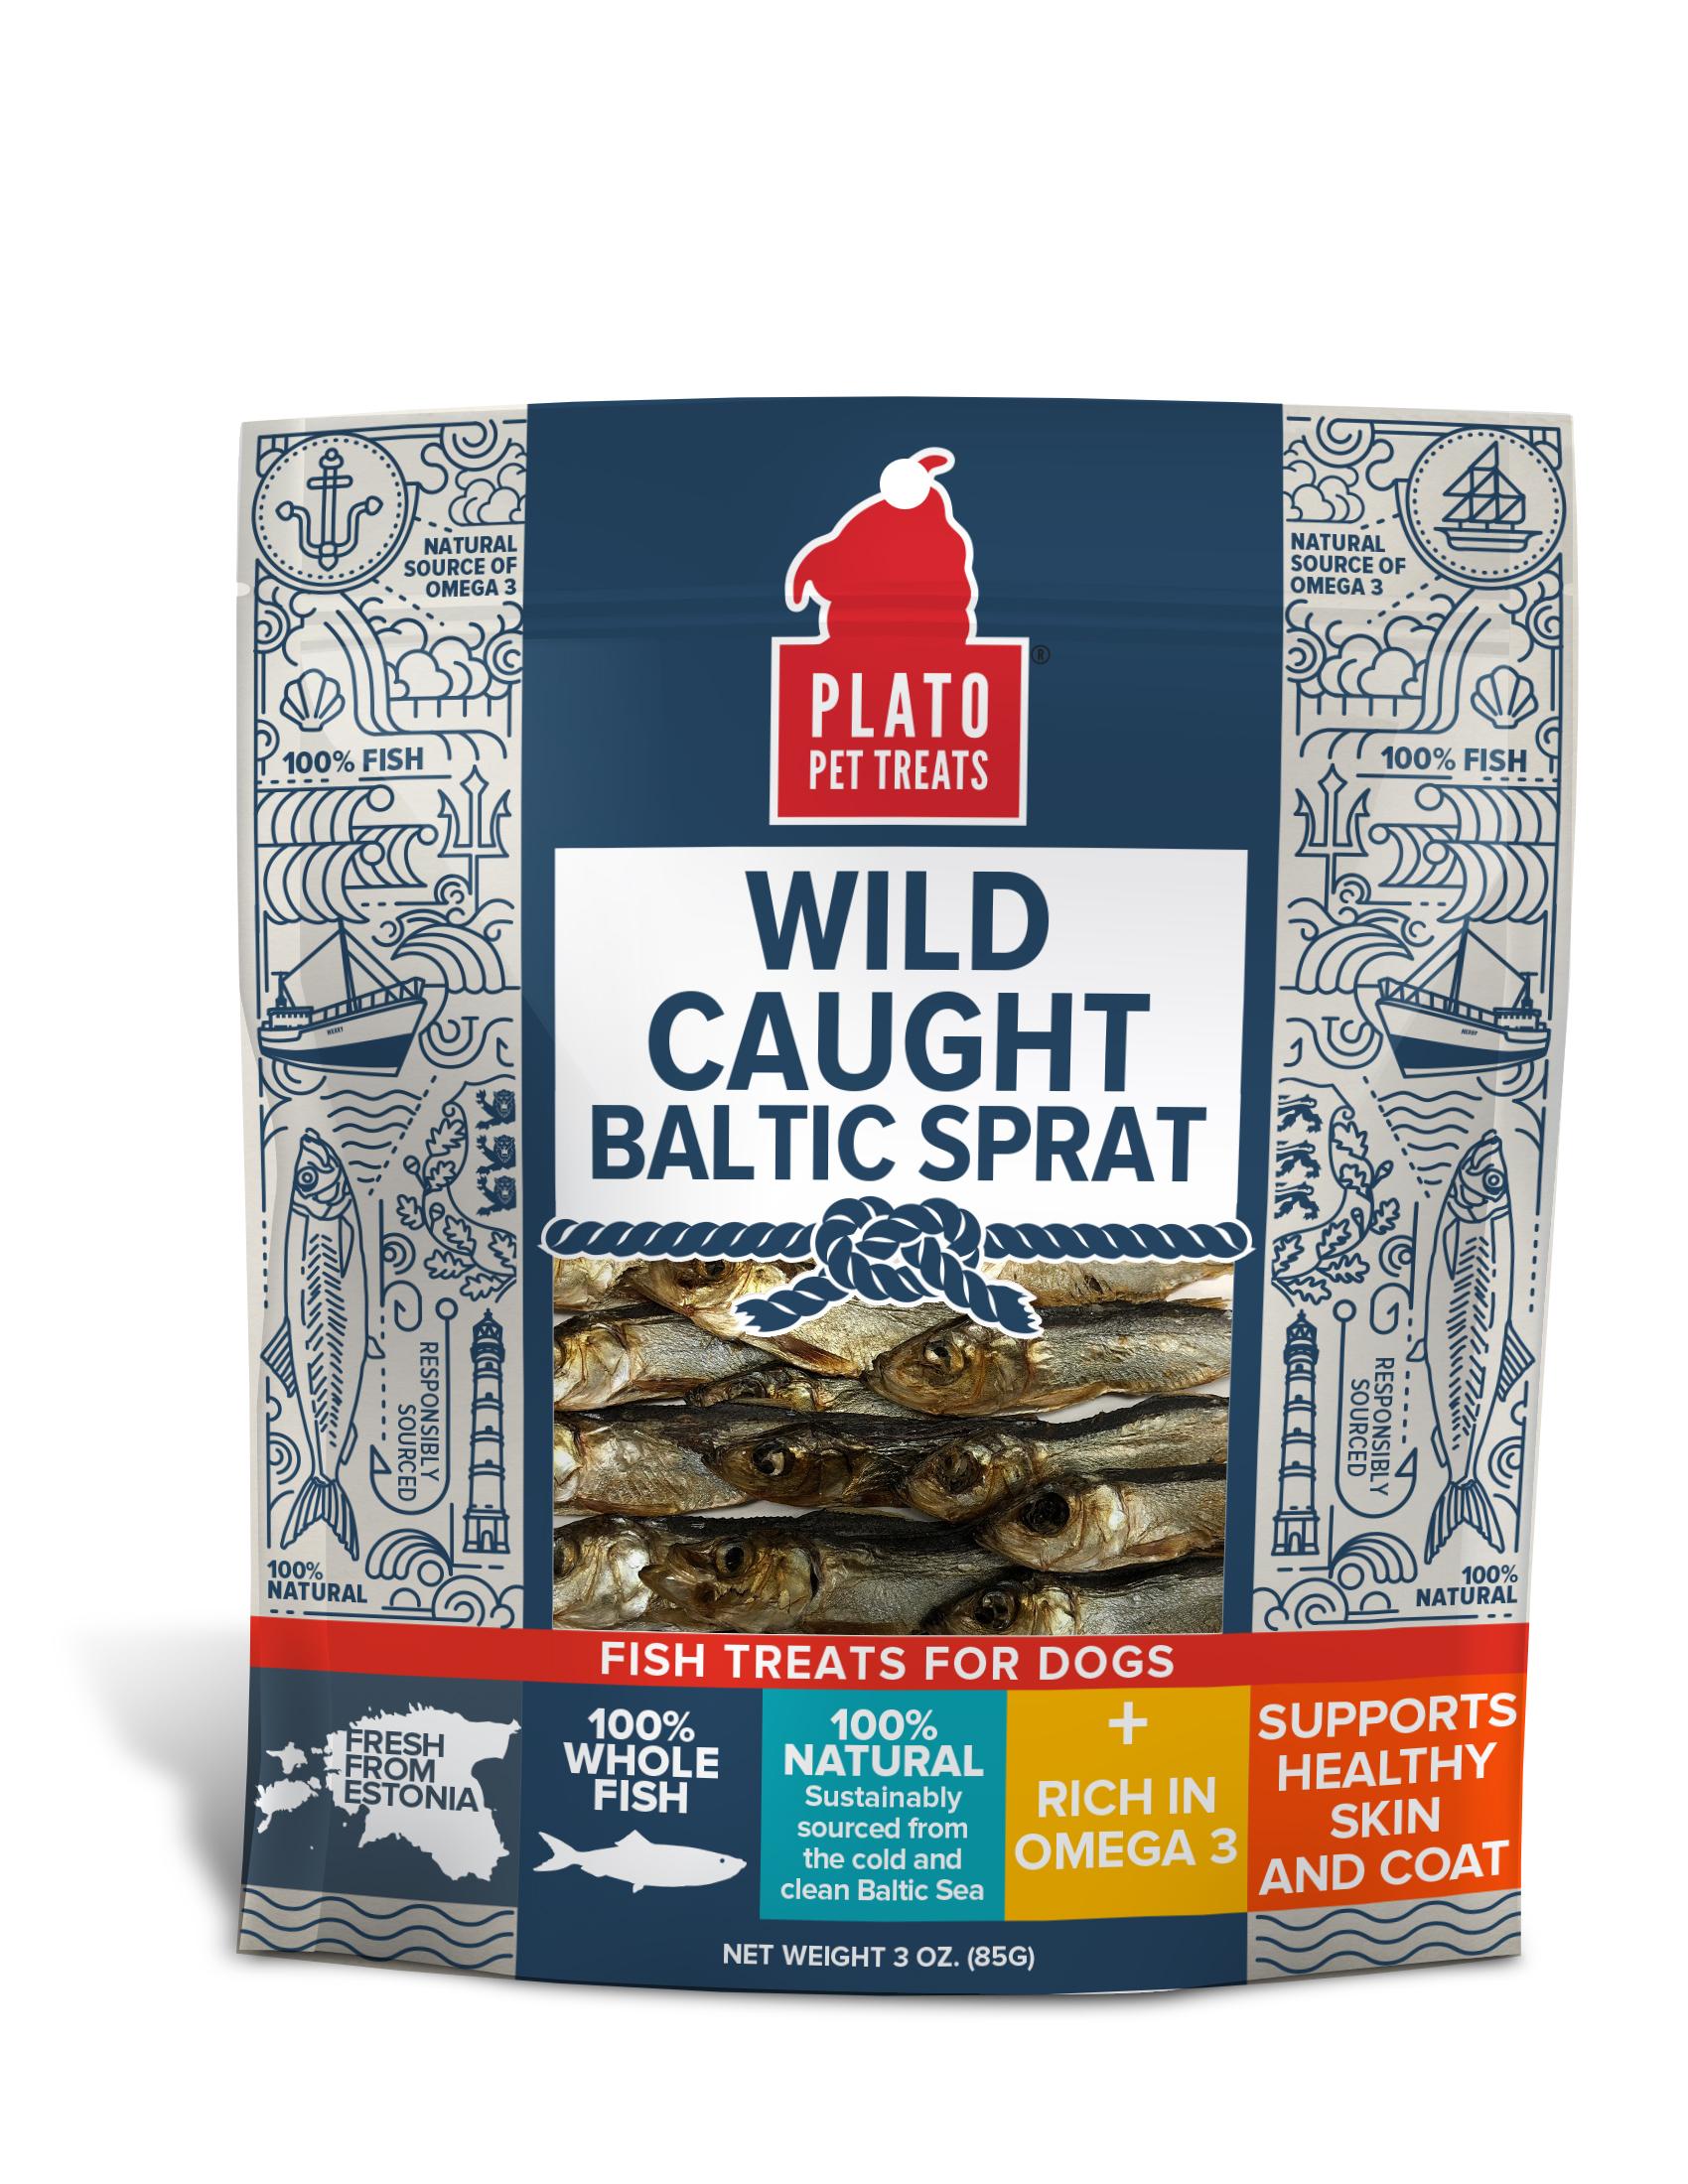 Plato Wild Caught Baltic Sprat Dog Treats, 3-oz bag